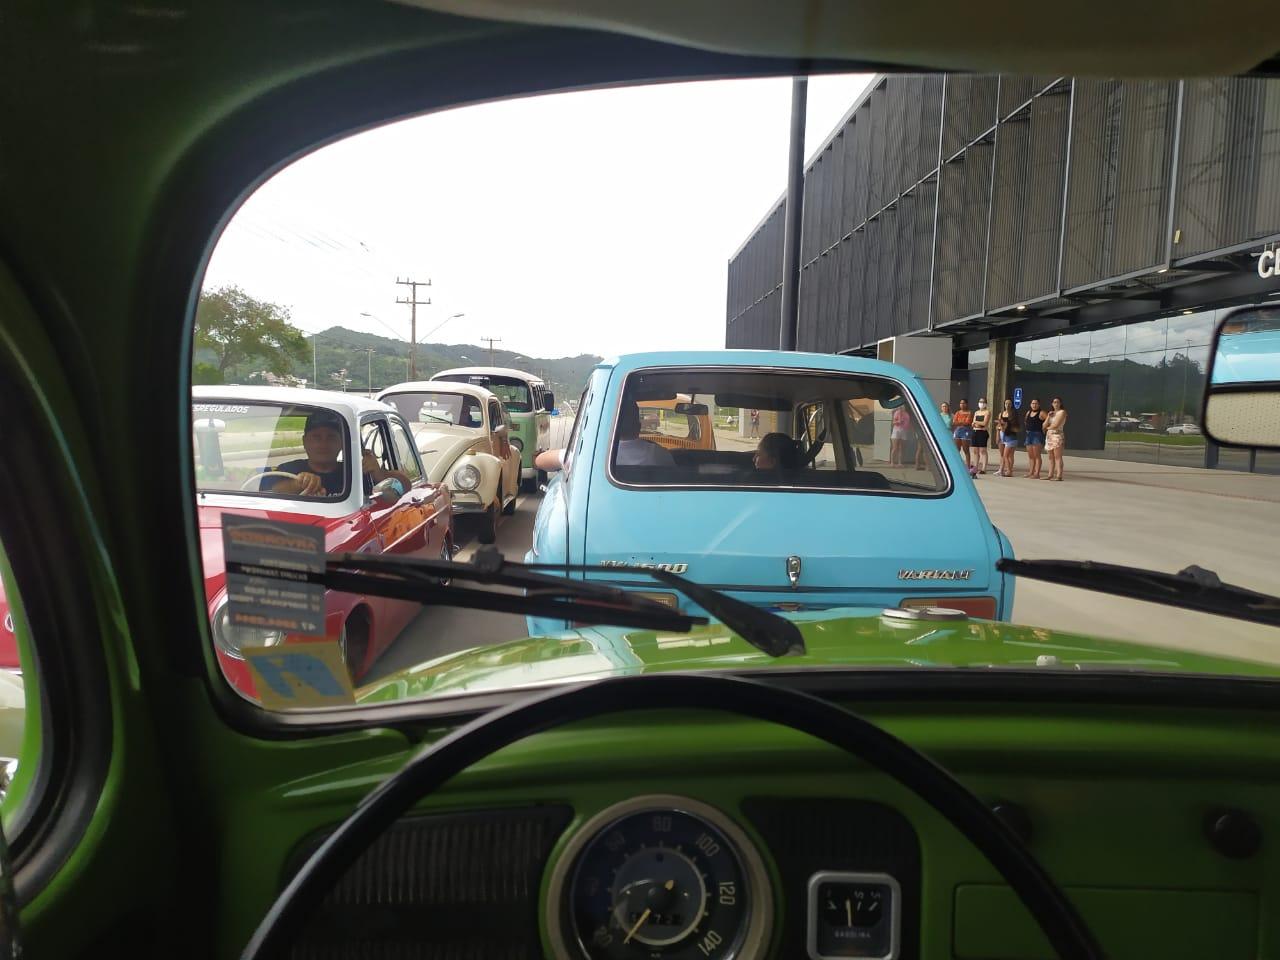 Carros de diversos modelos percorreram as ruas de Balneário Camboriú no domingo (17). - Wagner S. Rodrigues